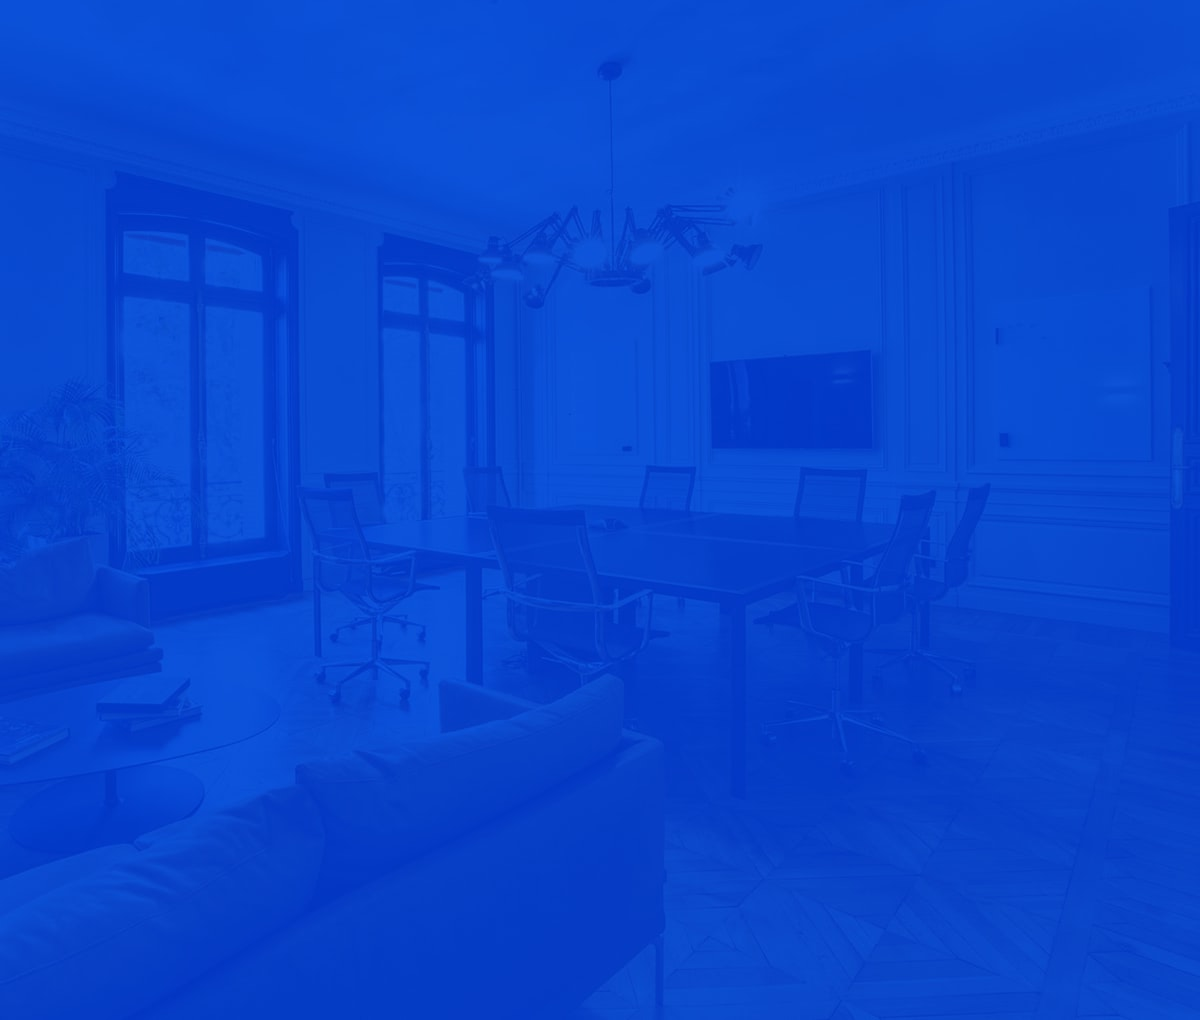 projet_UI_UX_DA_design_cabinet_turot@3x